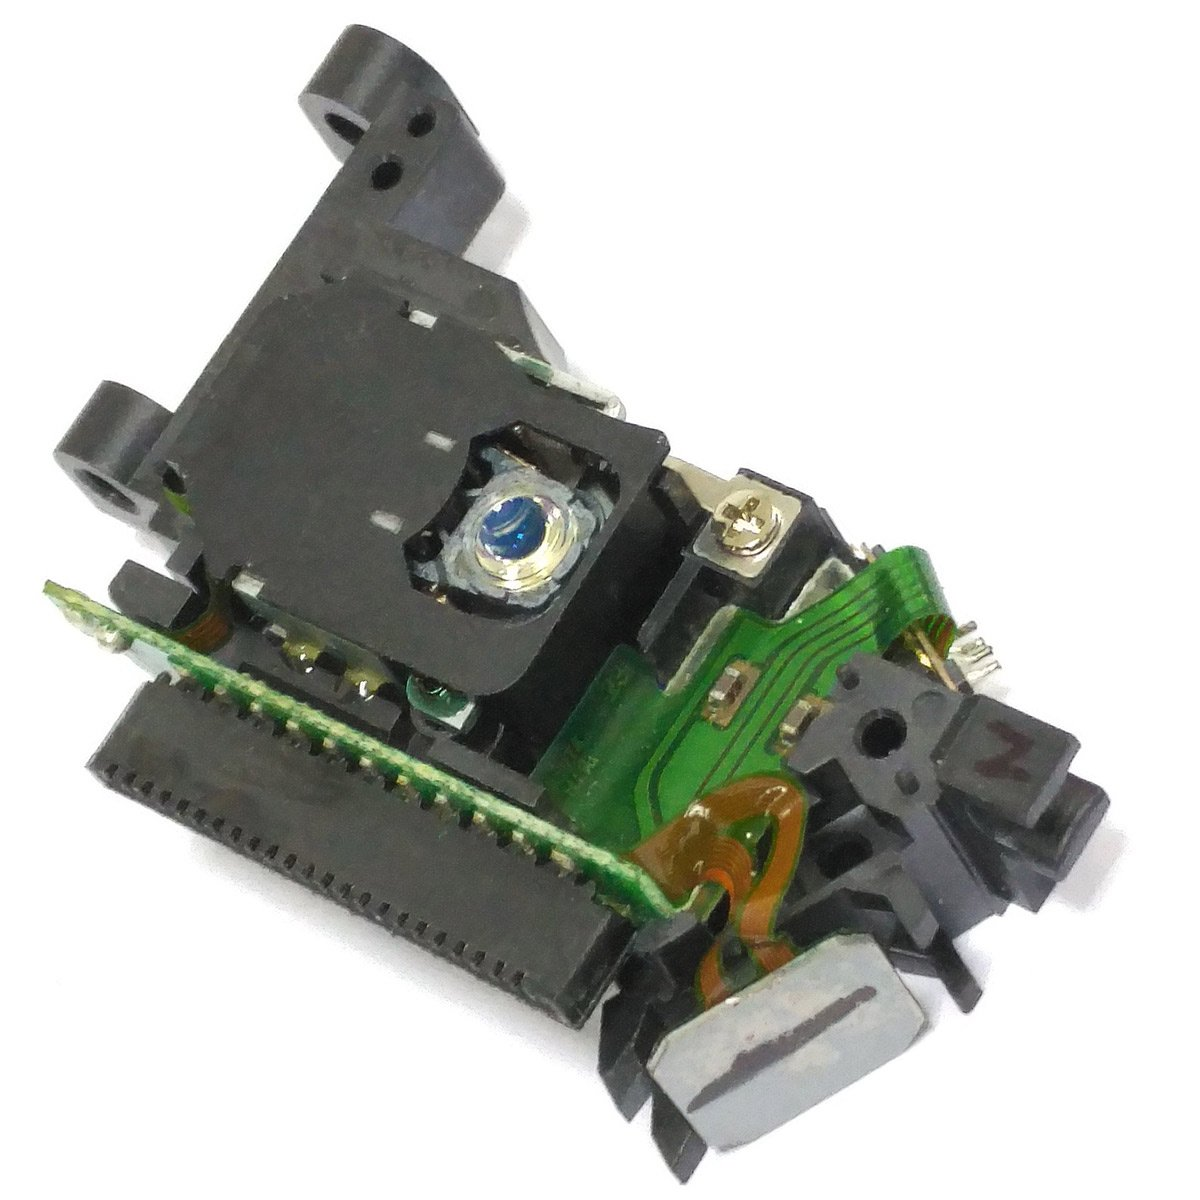 Original SACD Optical Pickup for AUDIO AERO La Source SACD Laser Lens by Allpartz